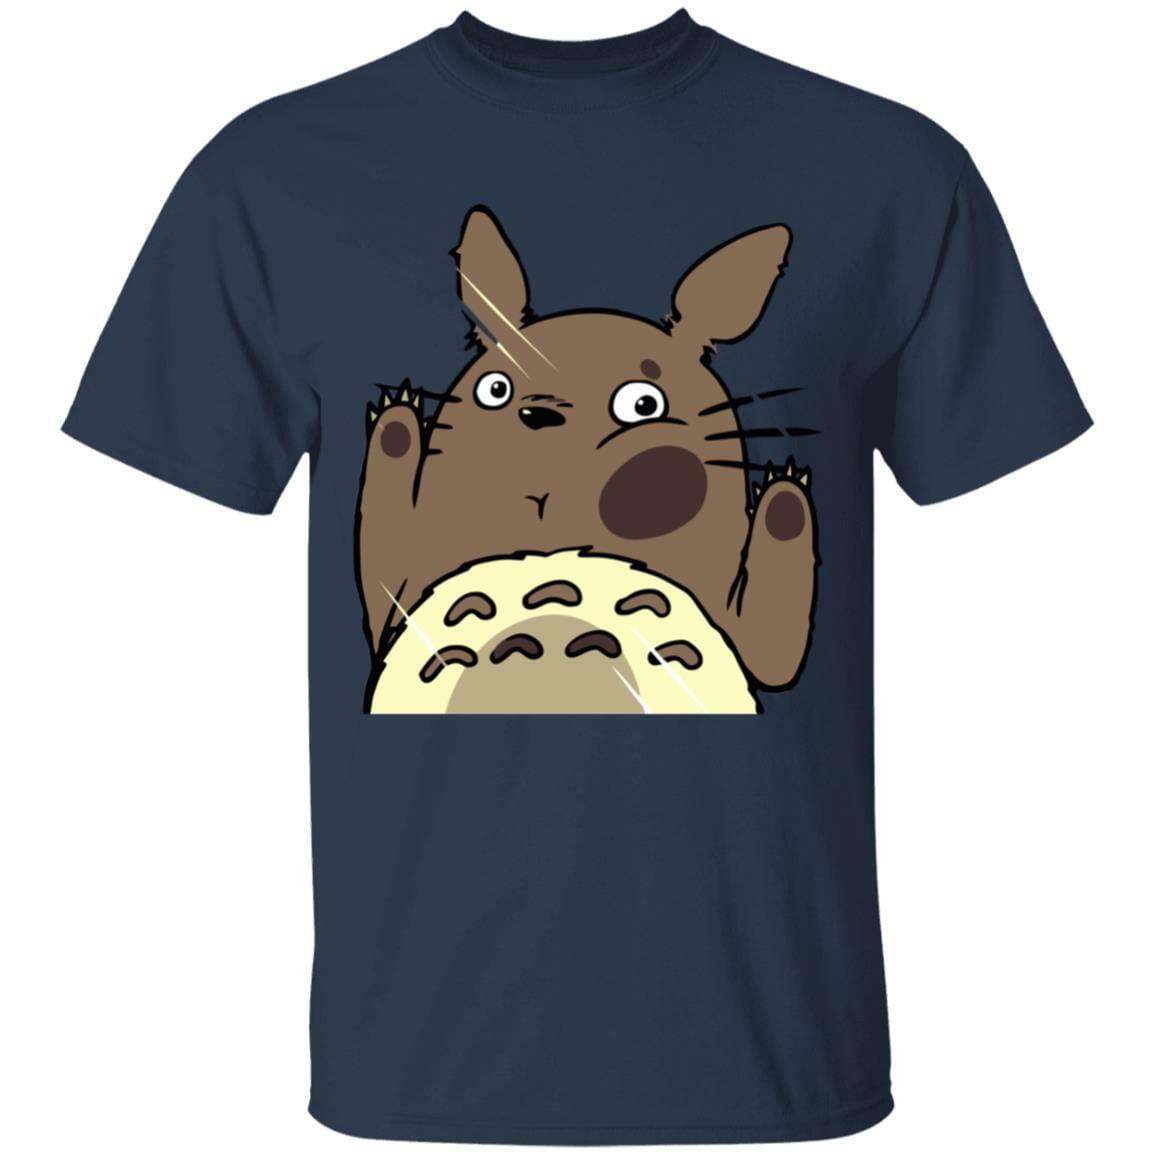 My Neighbor Totoro – Trapped Totoro T Shirt